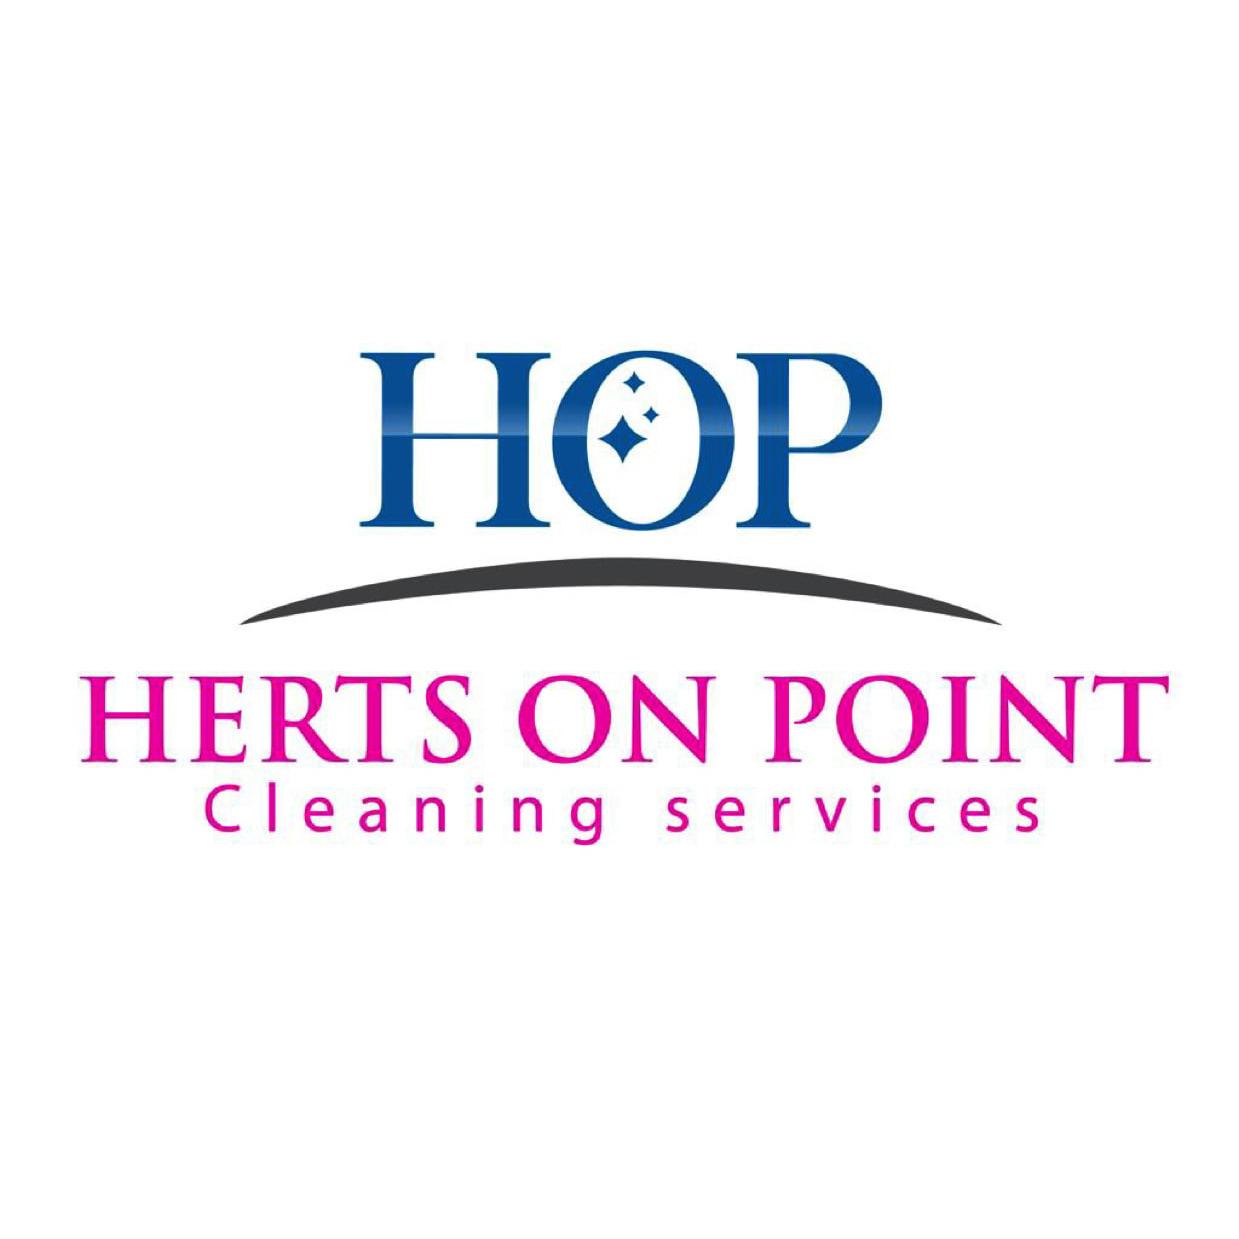 Herts on Point Cleaning Service Ltd - Hatfield, Hertfordshire AL10 9GE - 07809 695812 | ShowMeLocal.com